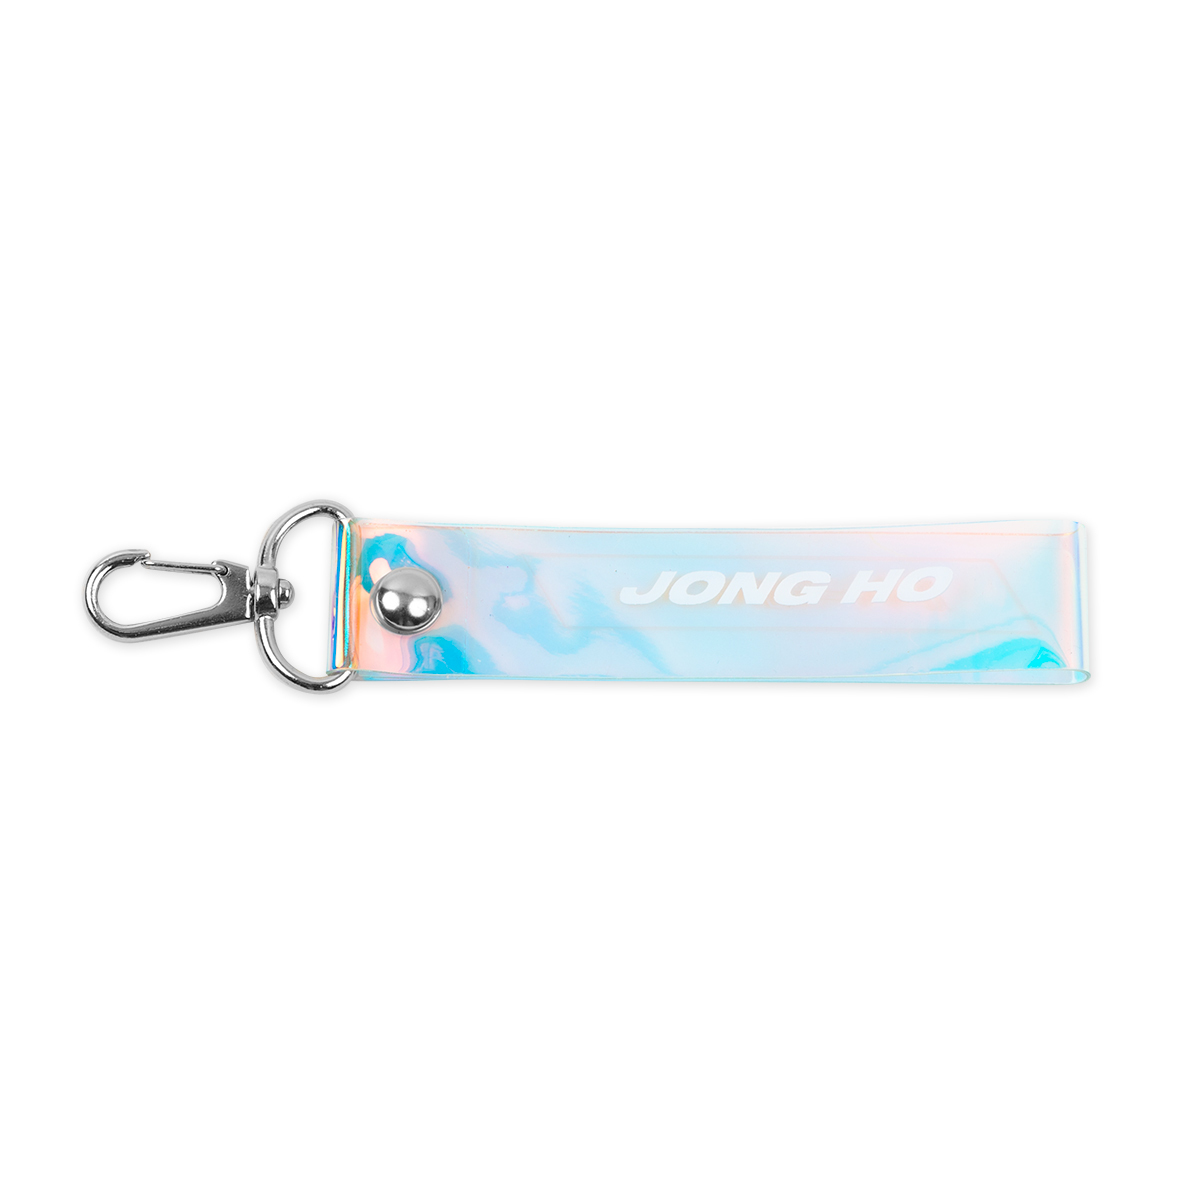 Keychain - Jong Ho